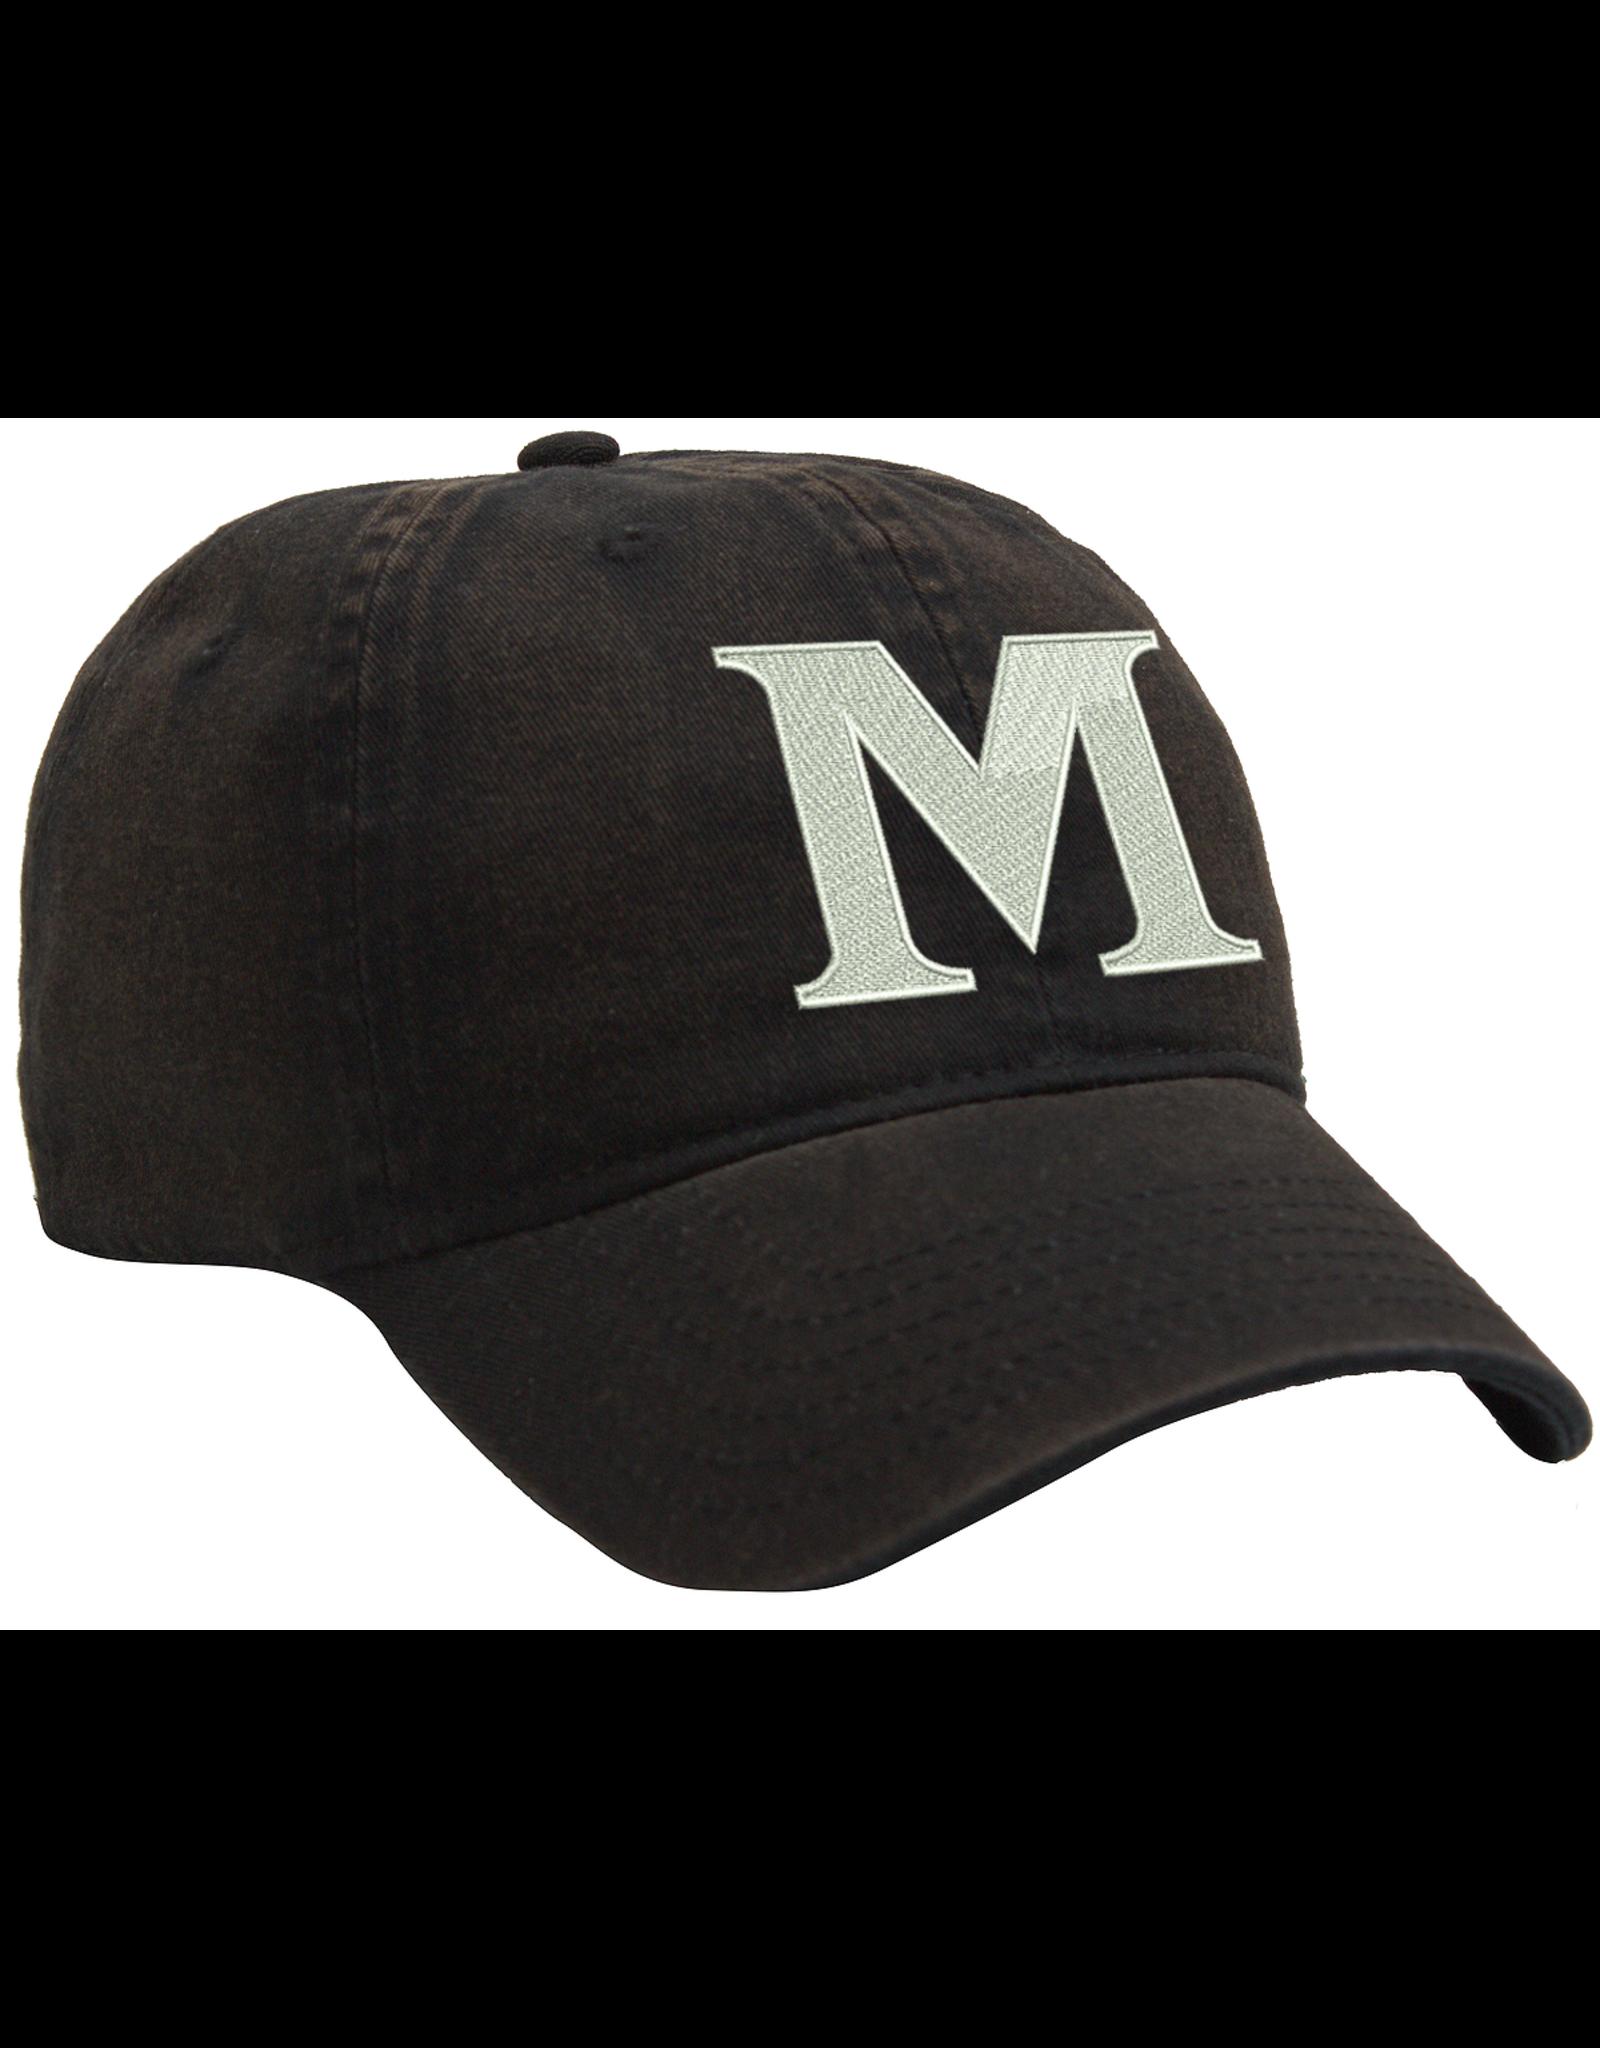 CLASSIC CUT COTTON CAP- Black